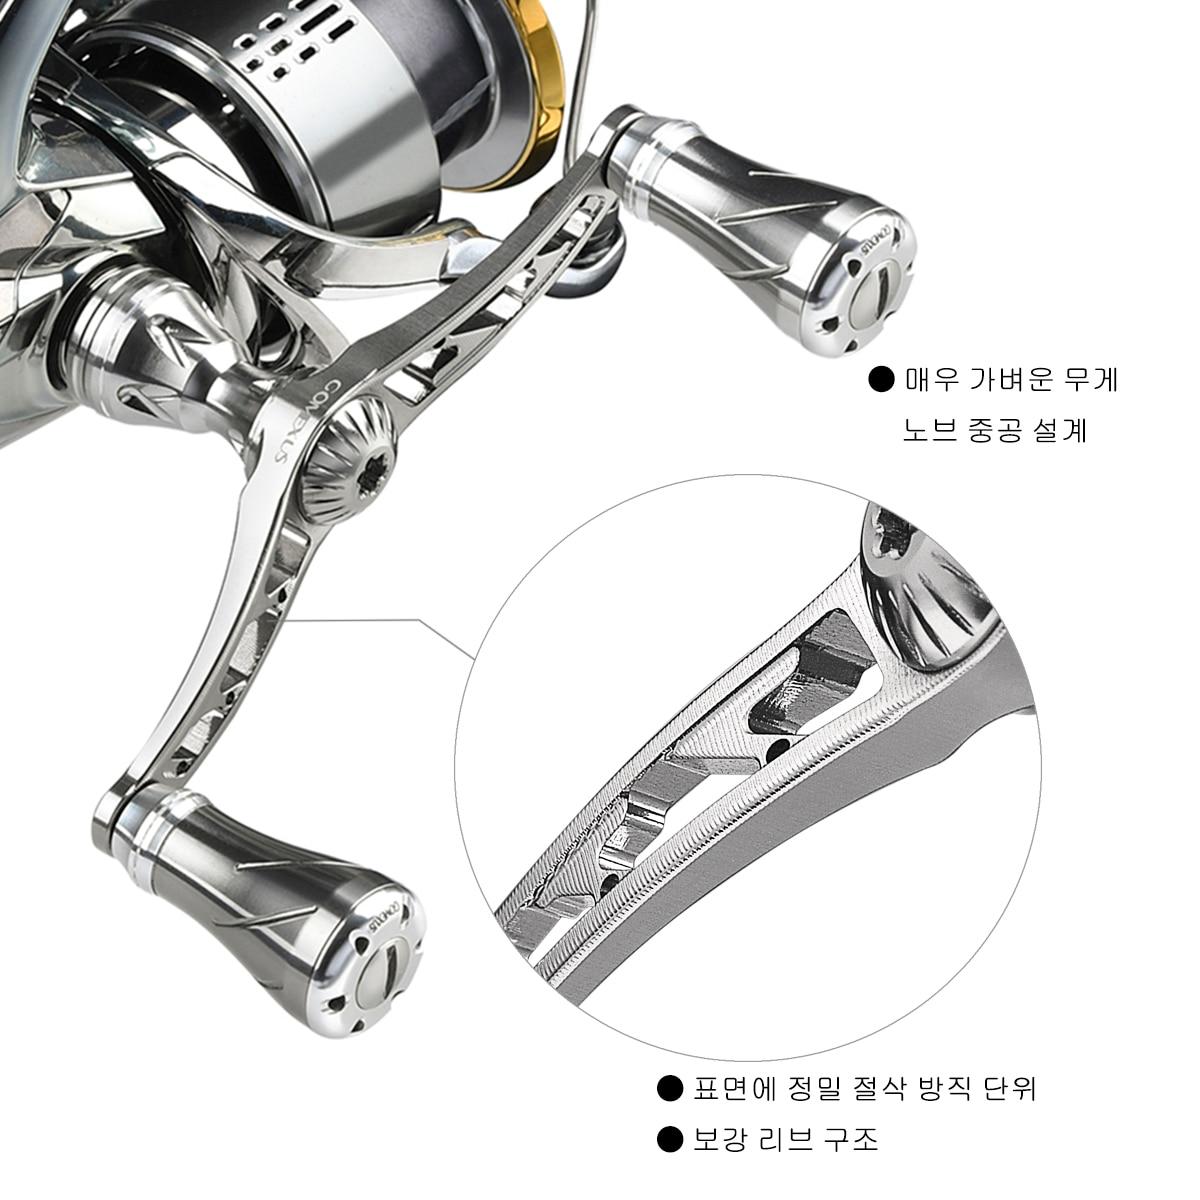 Daiwa Carbontex drag 12 EXIST 2506 15 FREAMS 2506H 2505F-H 15 EXIST 2505F